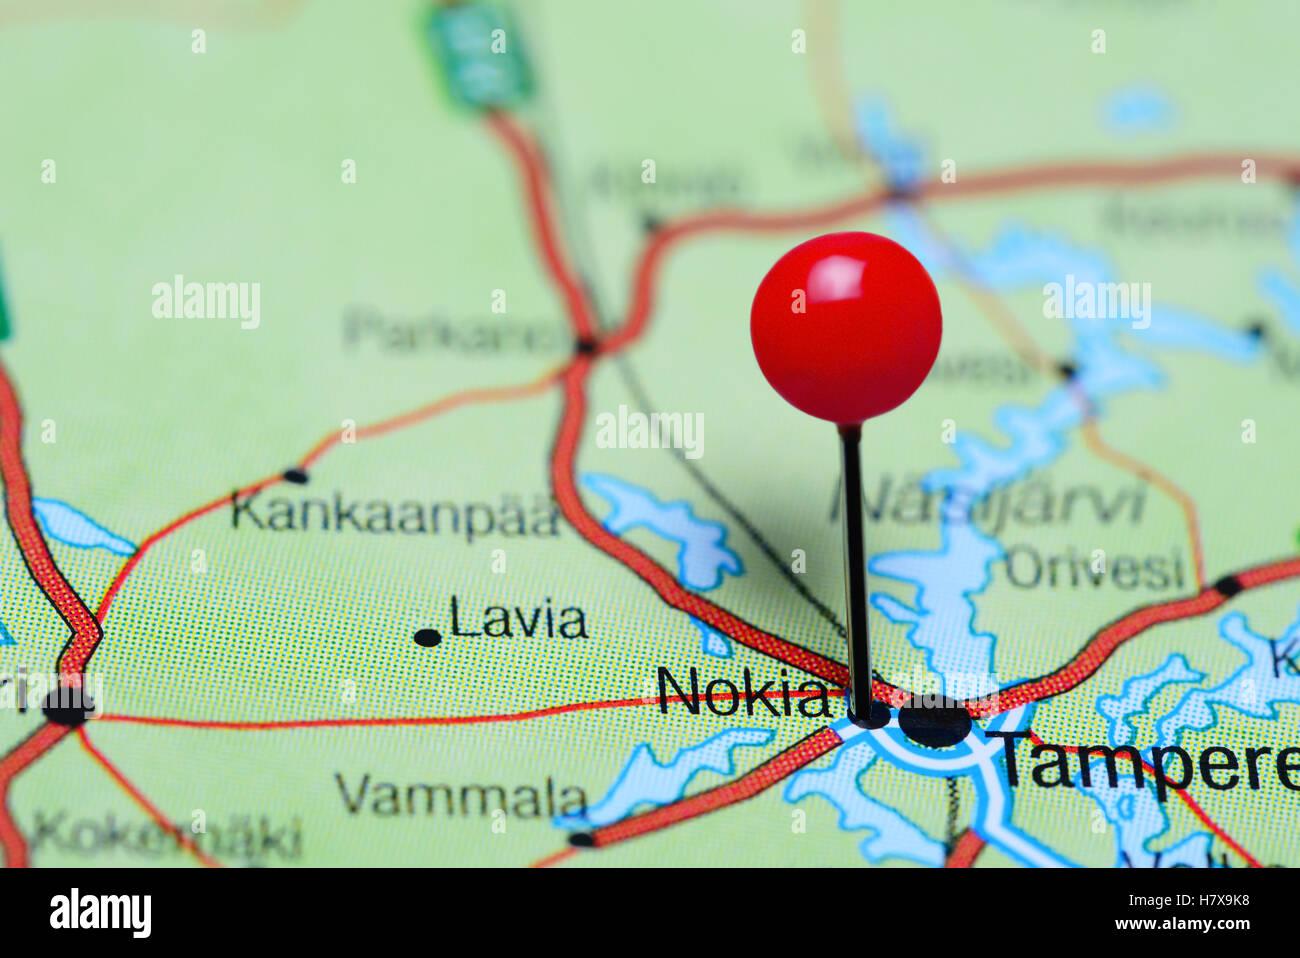 Nokia pinned on a map of Finland Stock Photo: 125353516 - Alamy on waze maps, tomtom maps, i phone maps, nokia n8, goolge maps, live maps, nokia e63, verizon maps, nokia c7-00, mobile development, nokia c6-01, nokia n9, google maps, windows phone 7, disney maps, apple maps, nokia c5, nokia n97, yahoo! maps, experian maps, aviation weather maps, nokia c5-03, tele atlas maps, mcgraw hill maps, nokia e72, nokia e52, at&t maps, bing maps, ios7 maps, msn maps, windows maps, rand mcnally maps, hdri maps,